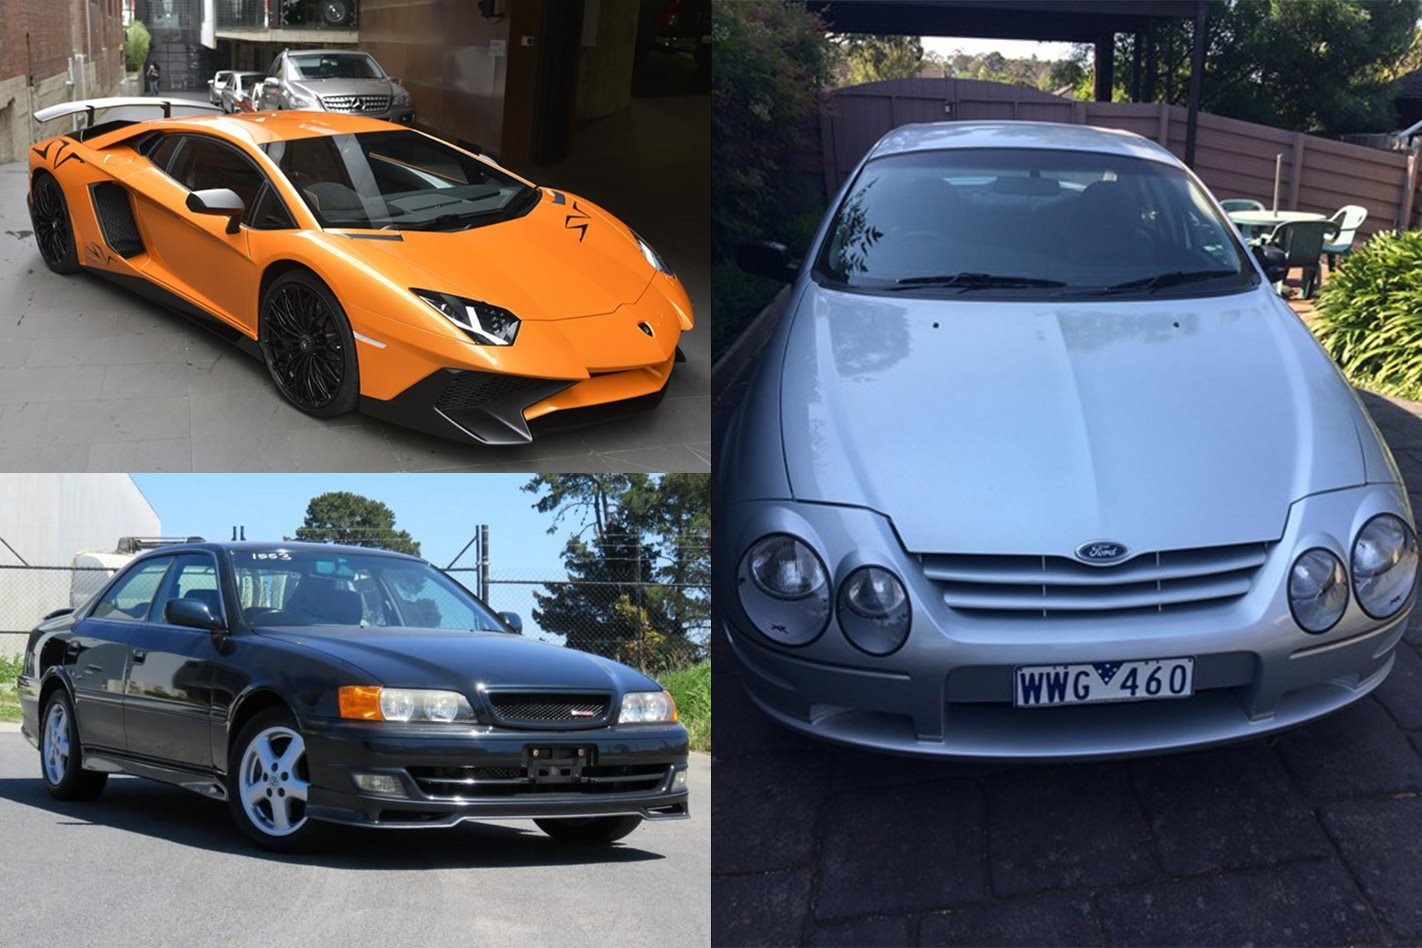 Excellent Kit Car Classifieds Images - Classic Cars Ideas - boiq.info